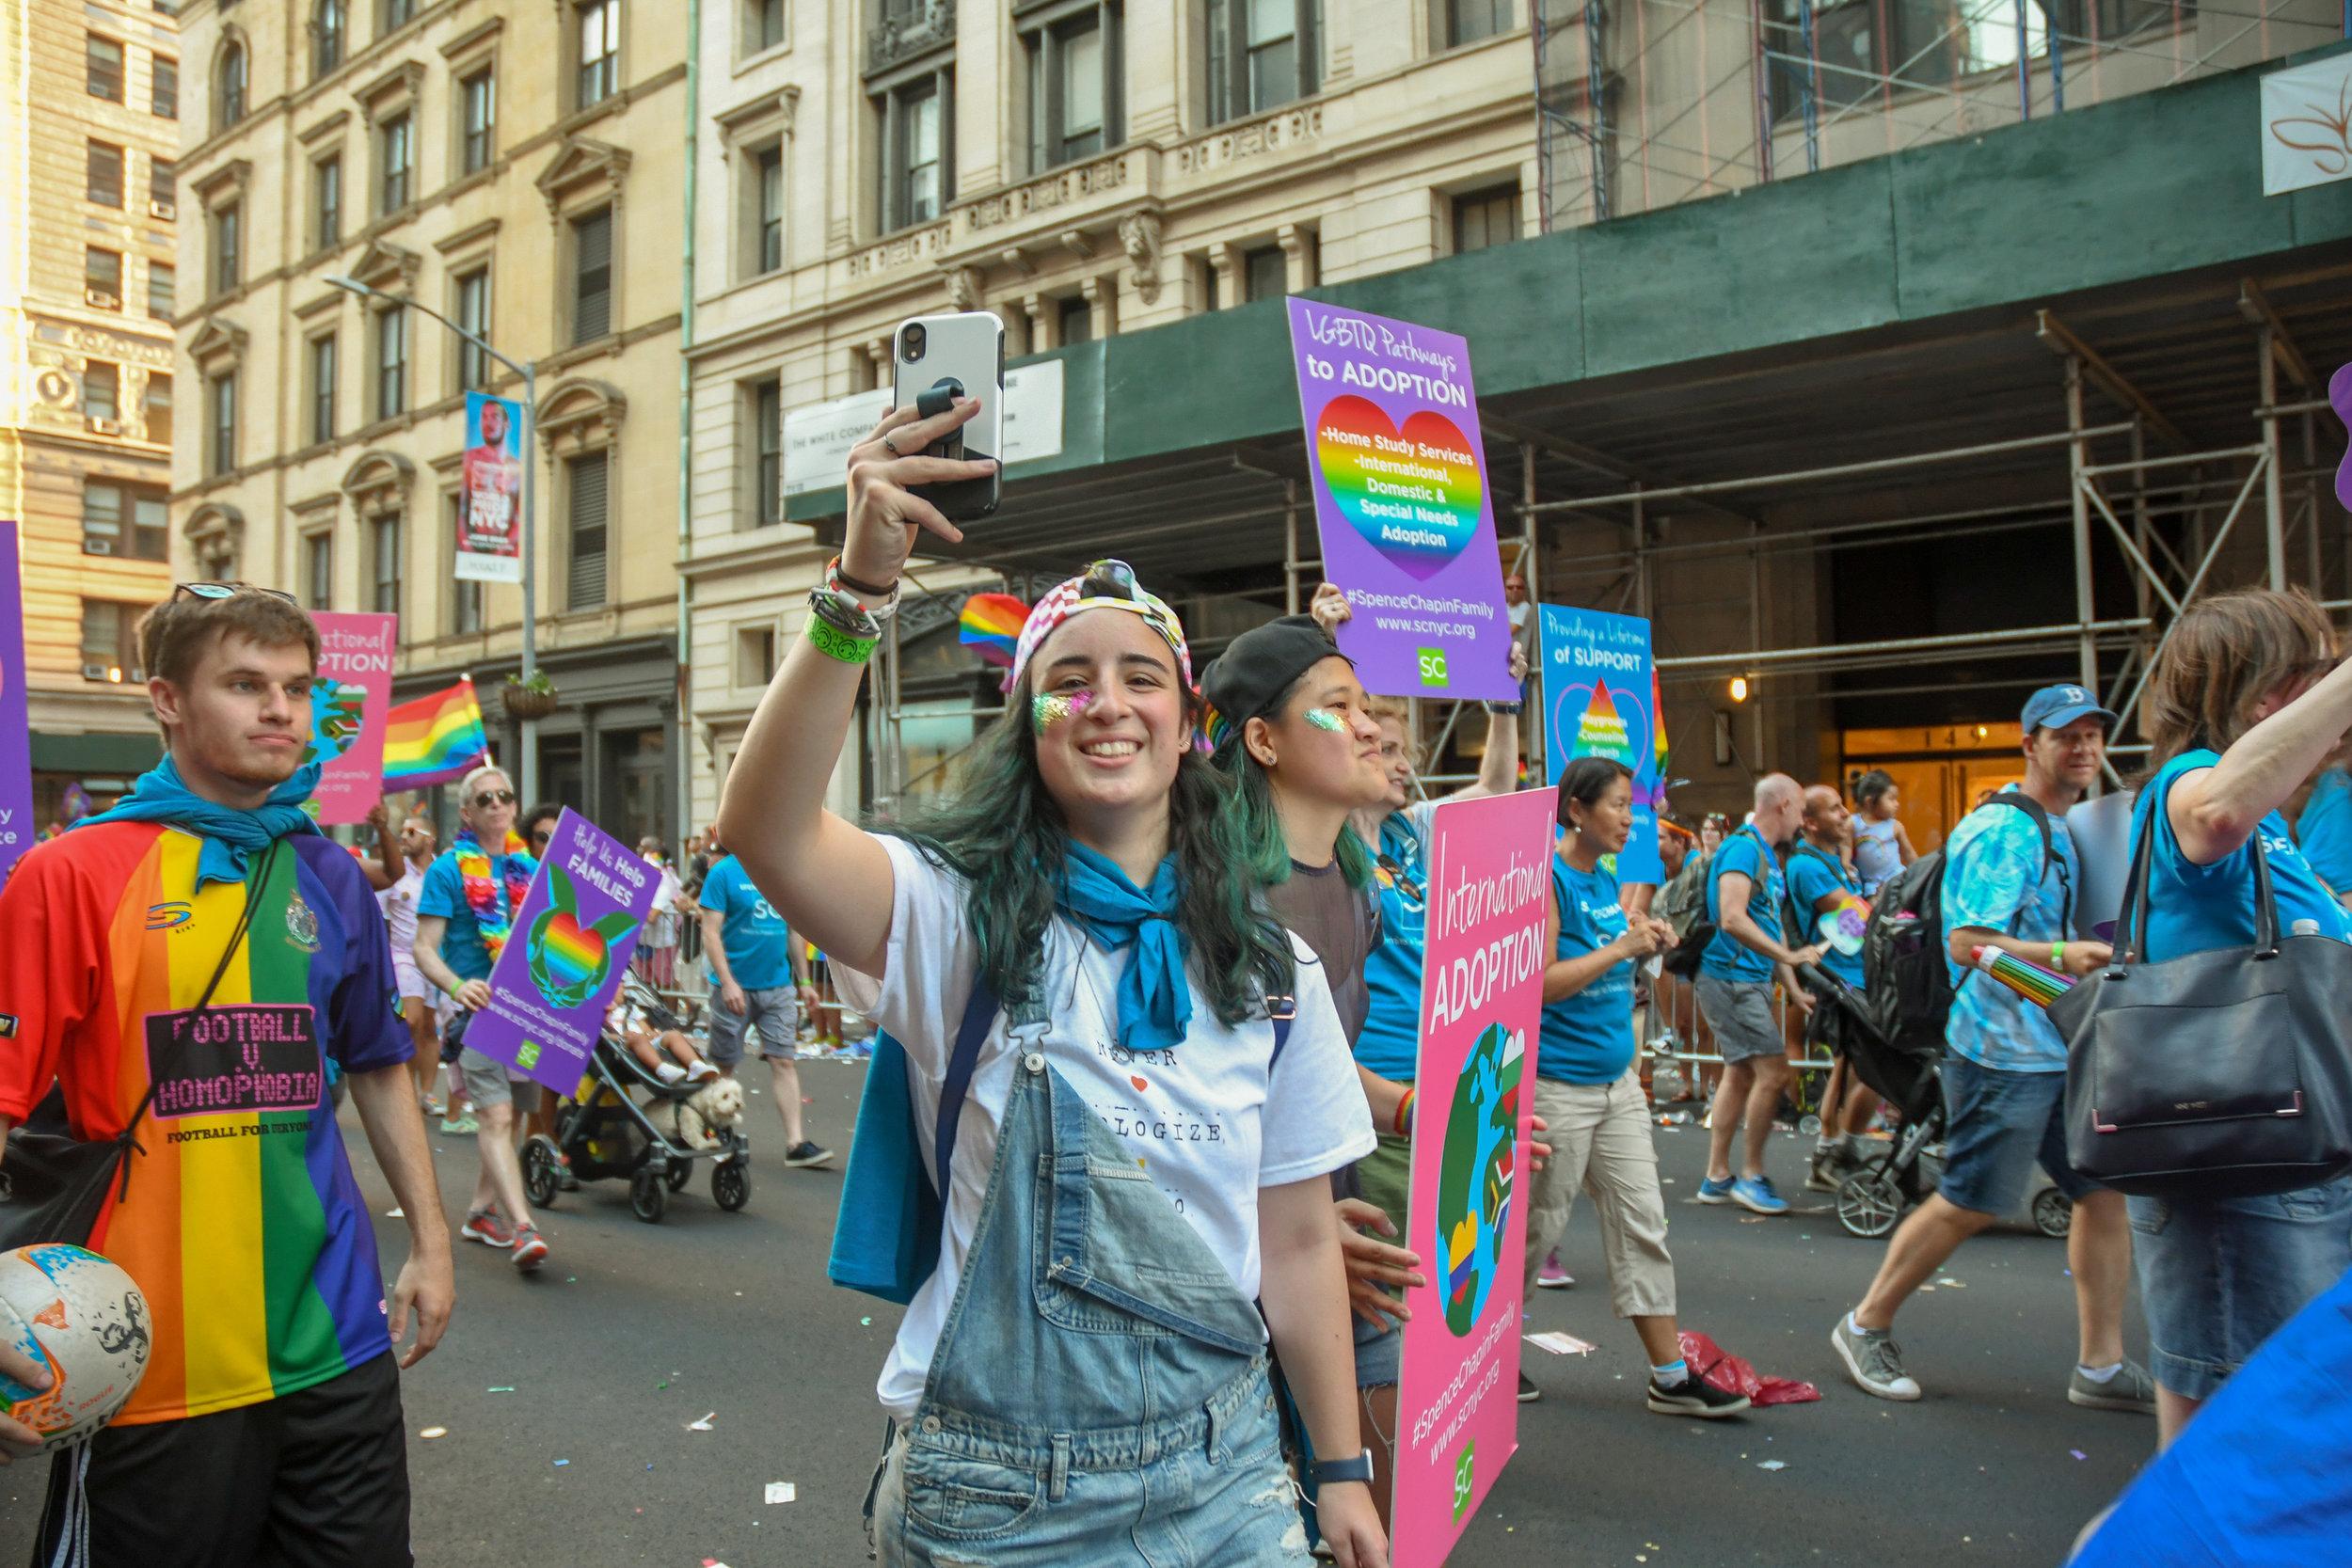 SC-PrideParade-2019_FE-188.jpg